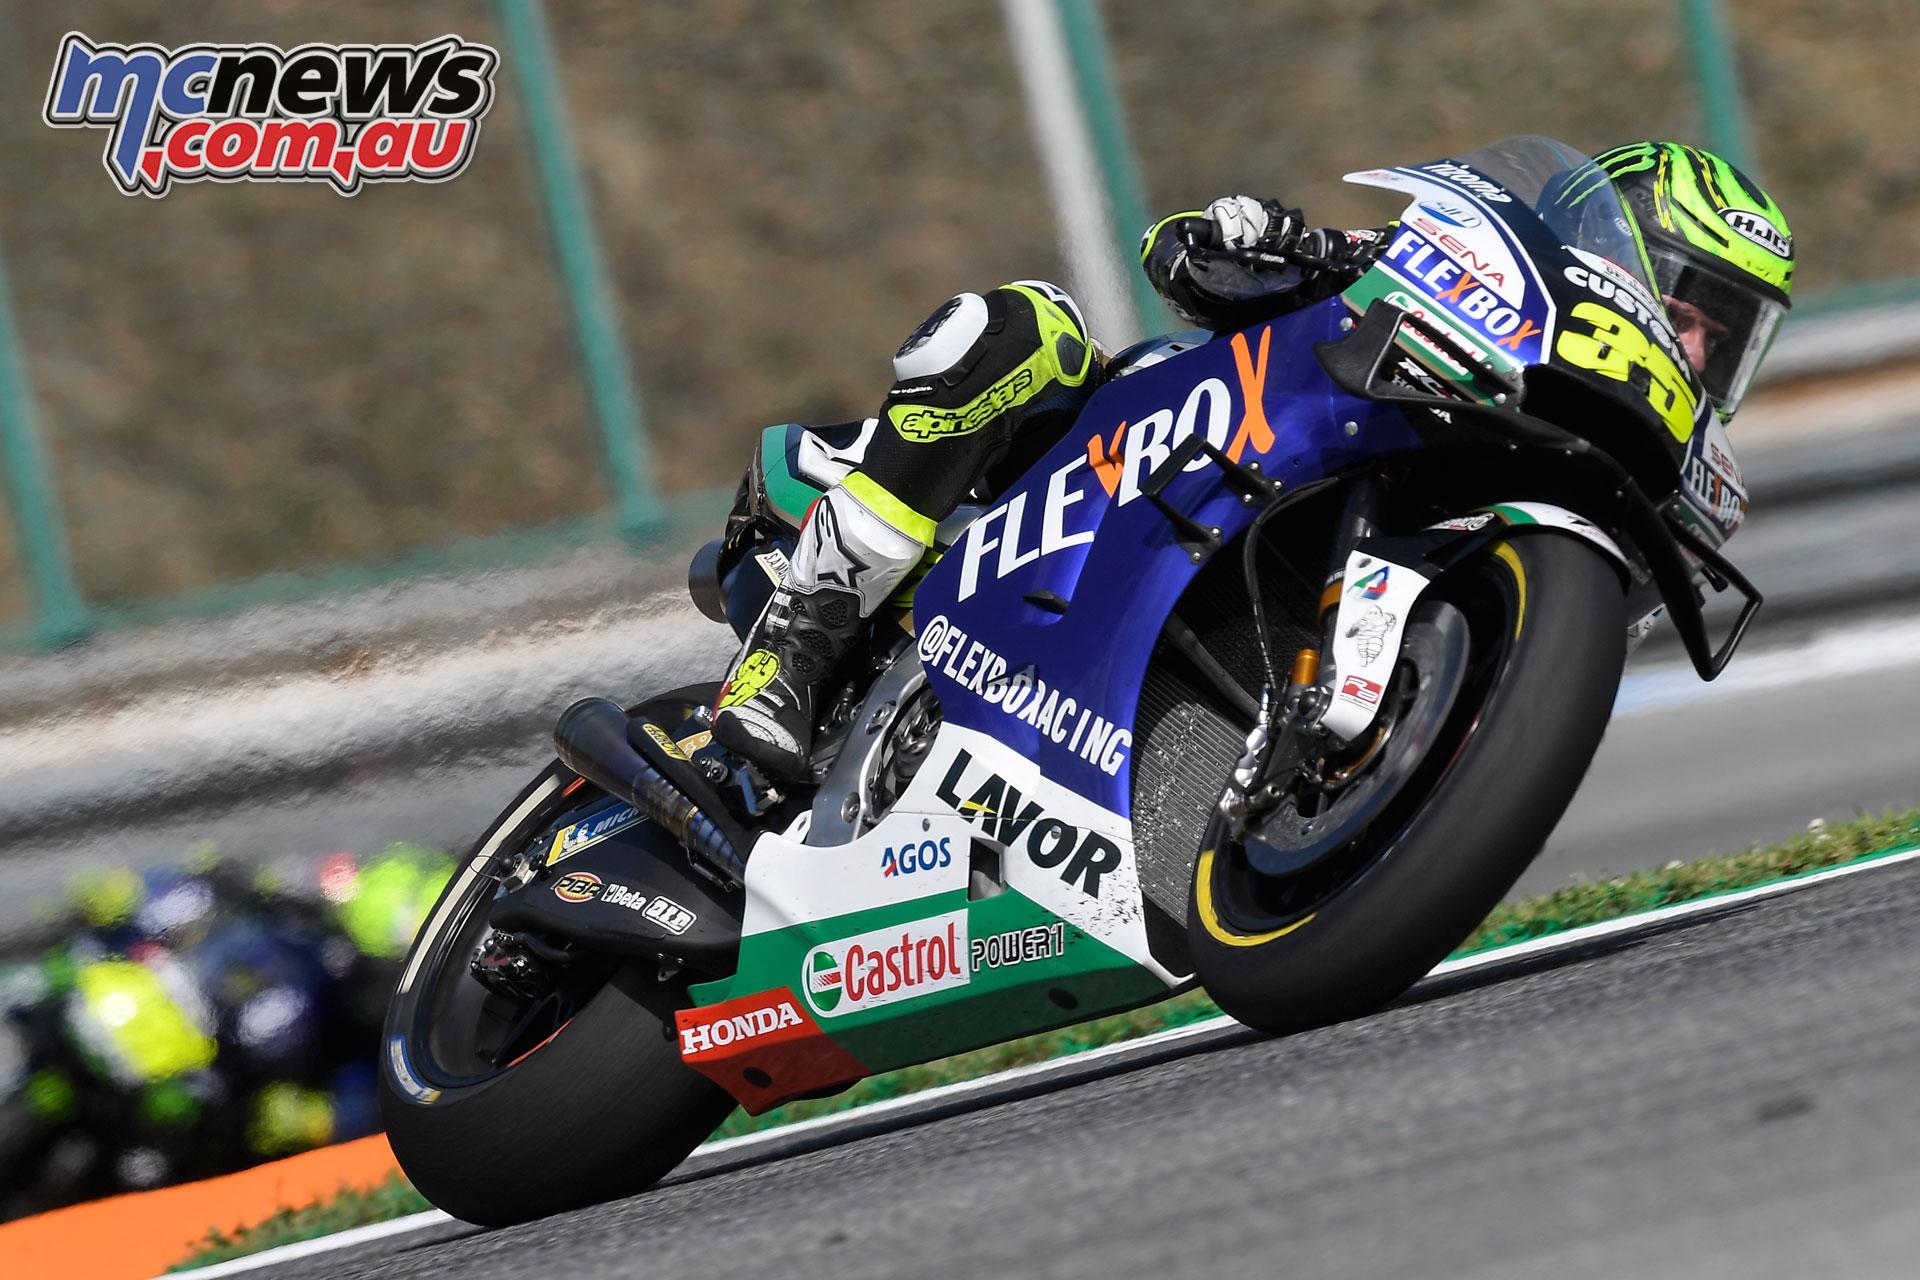 MotoGP Rnd Brno Crutchlow